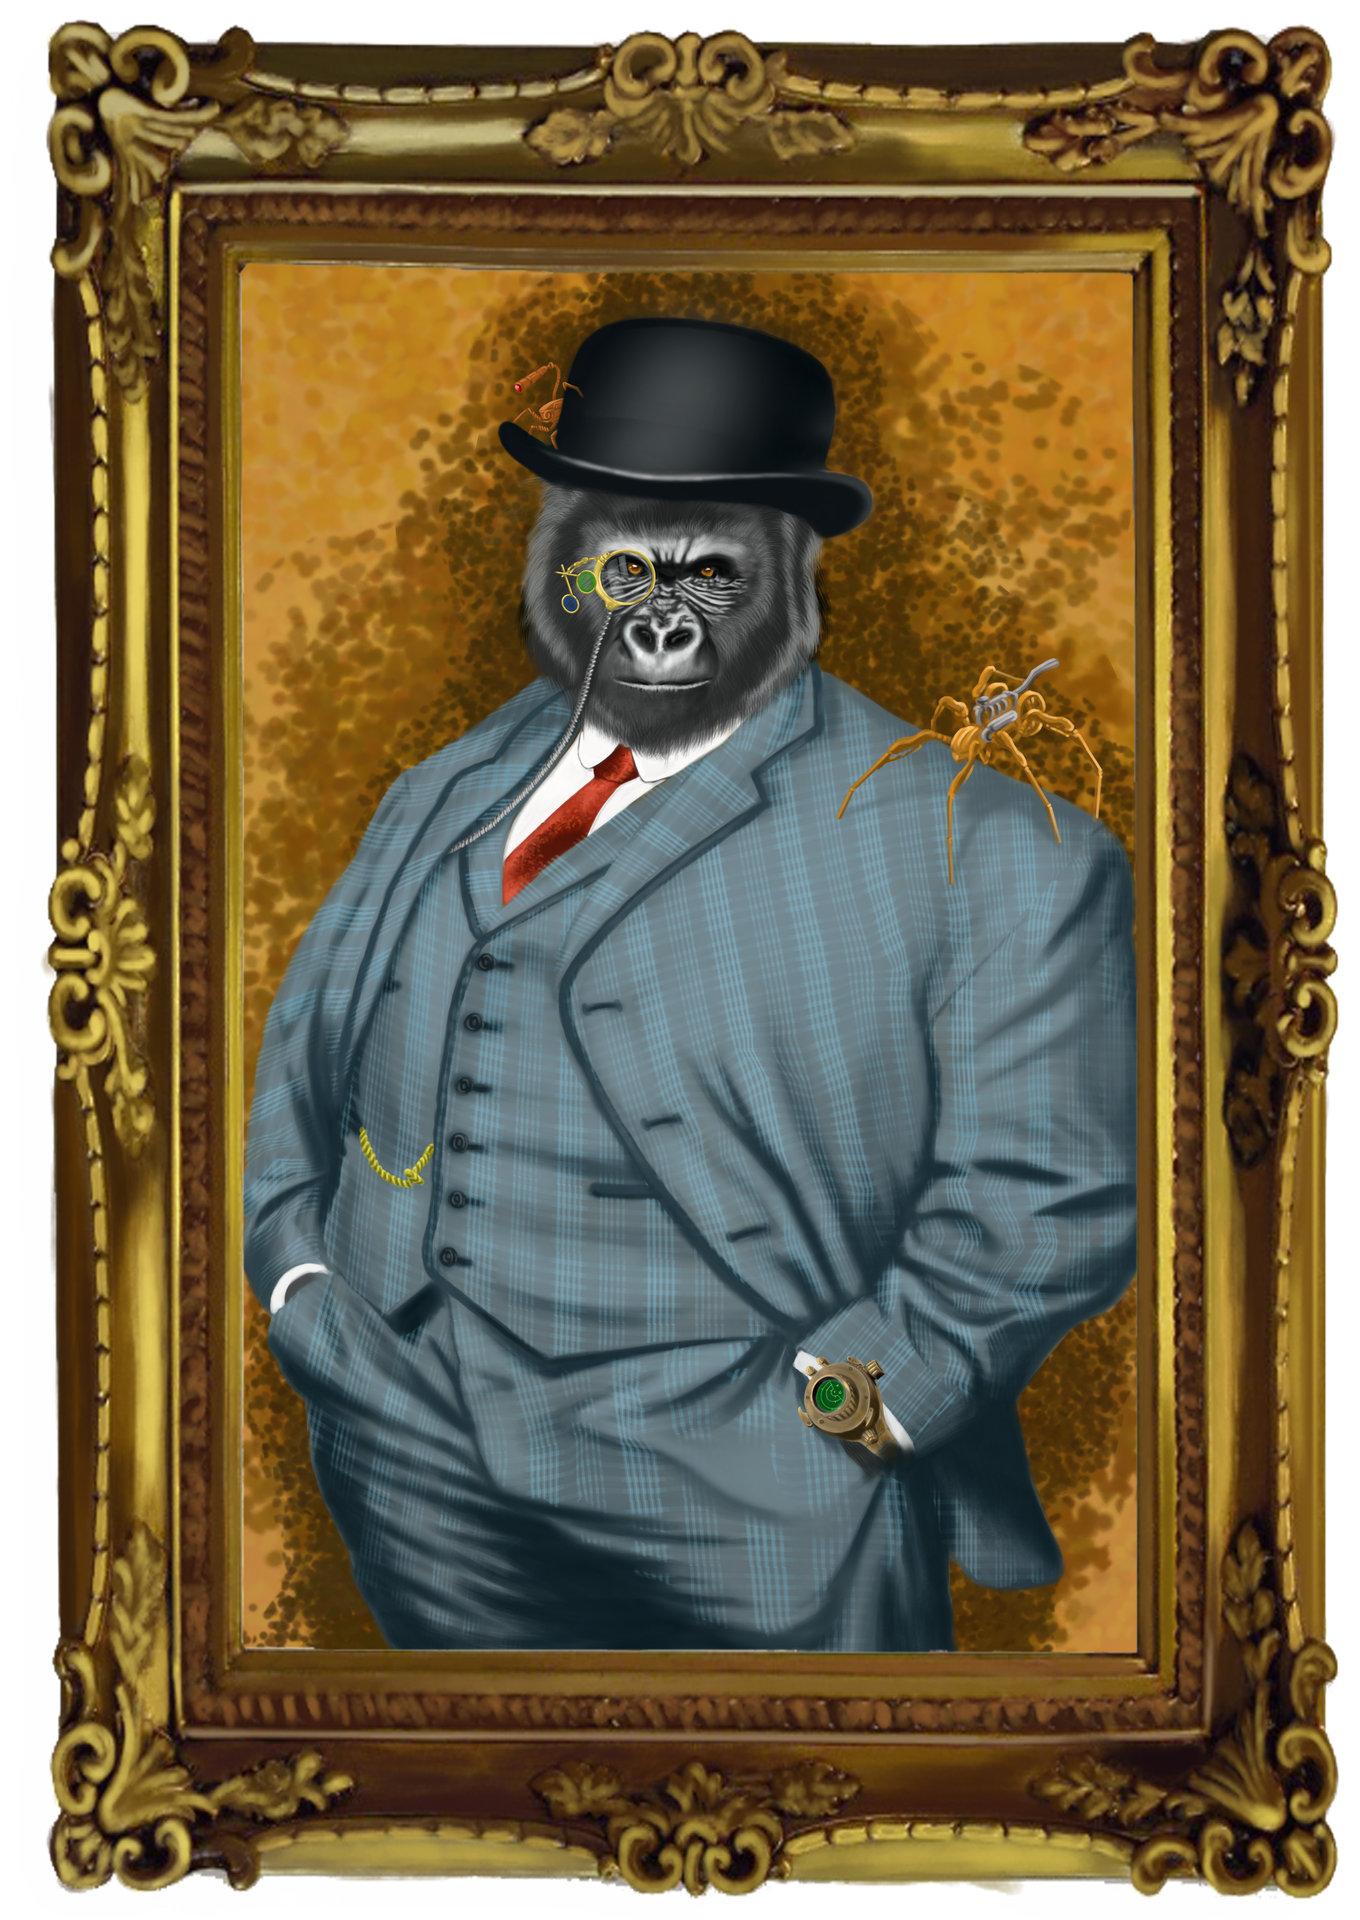 Daniel hidalgo vicente gorila marco